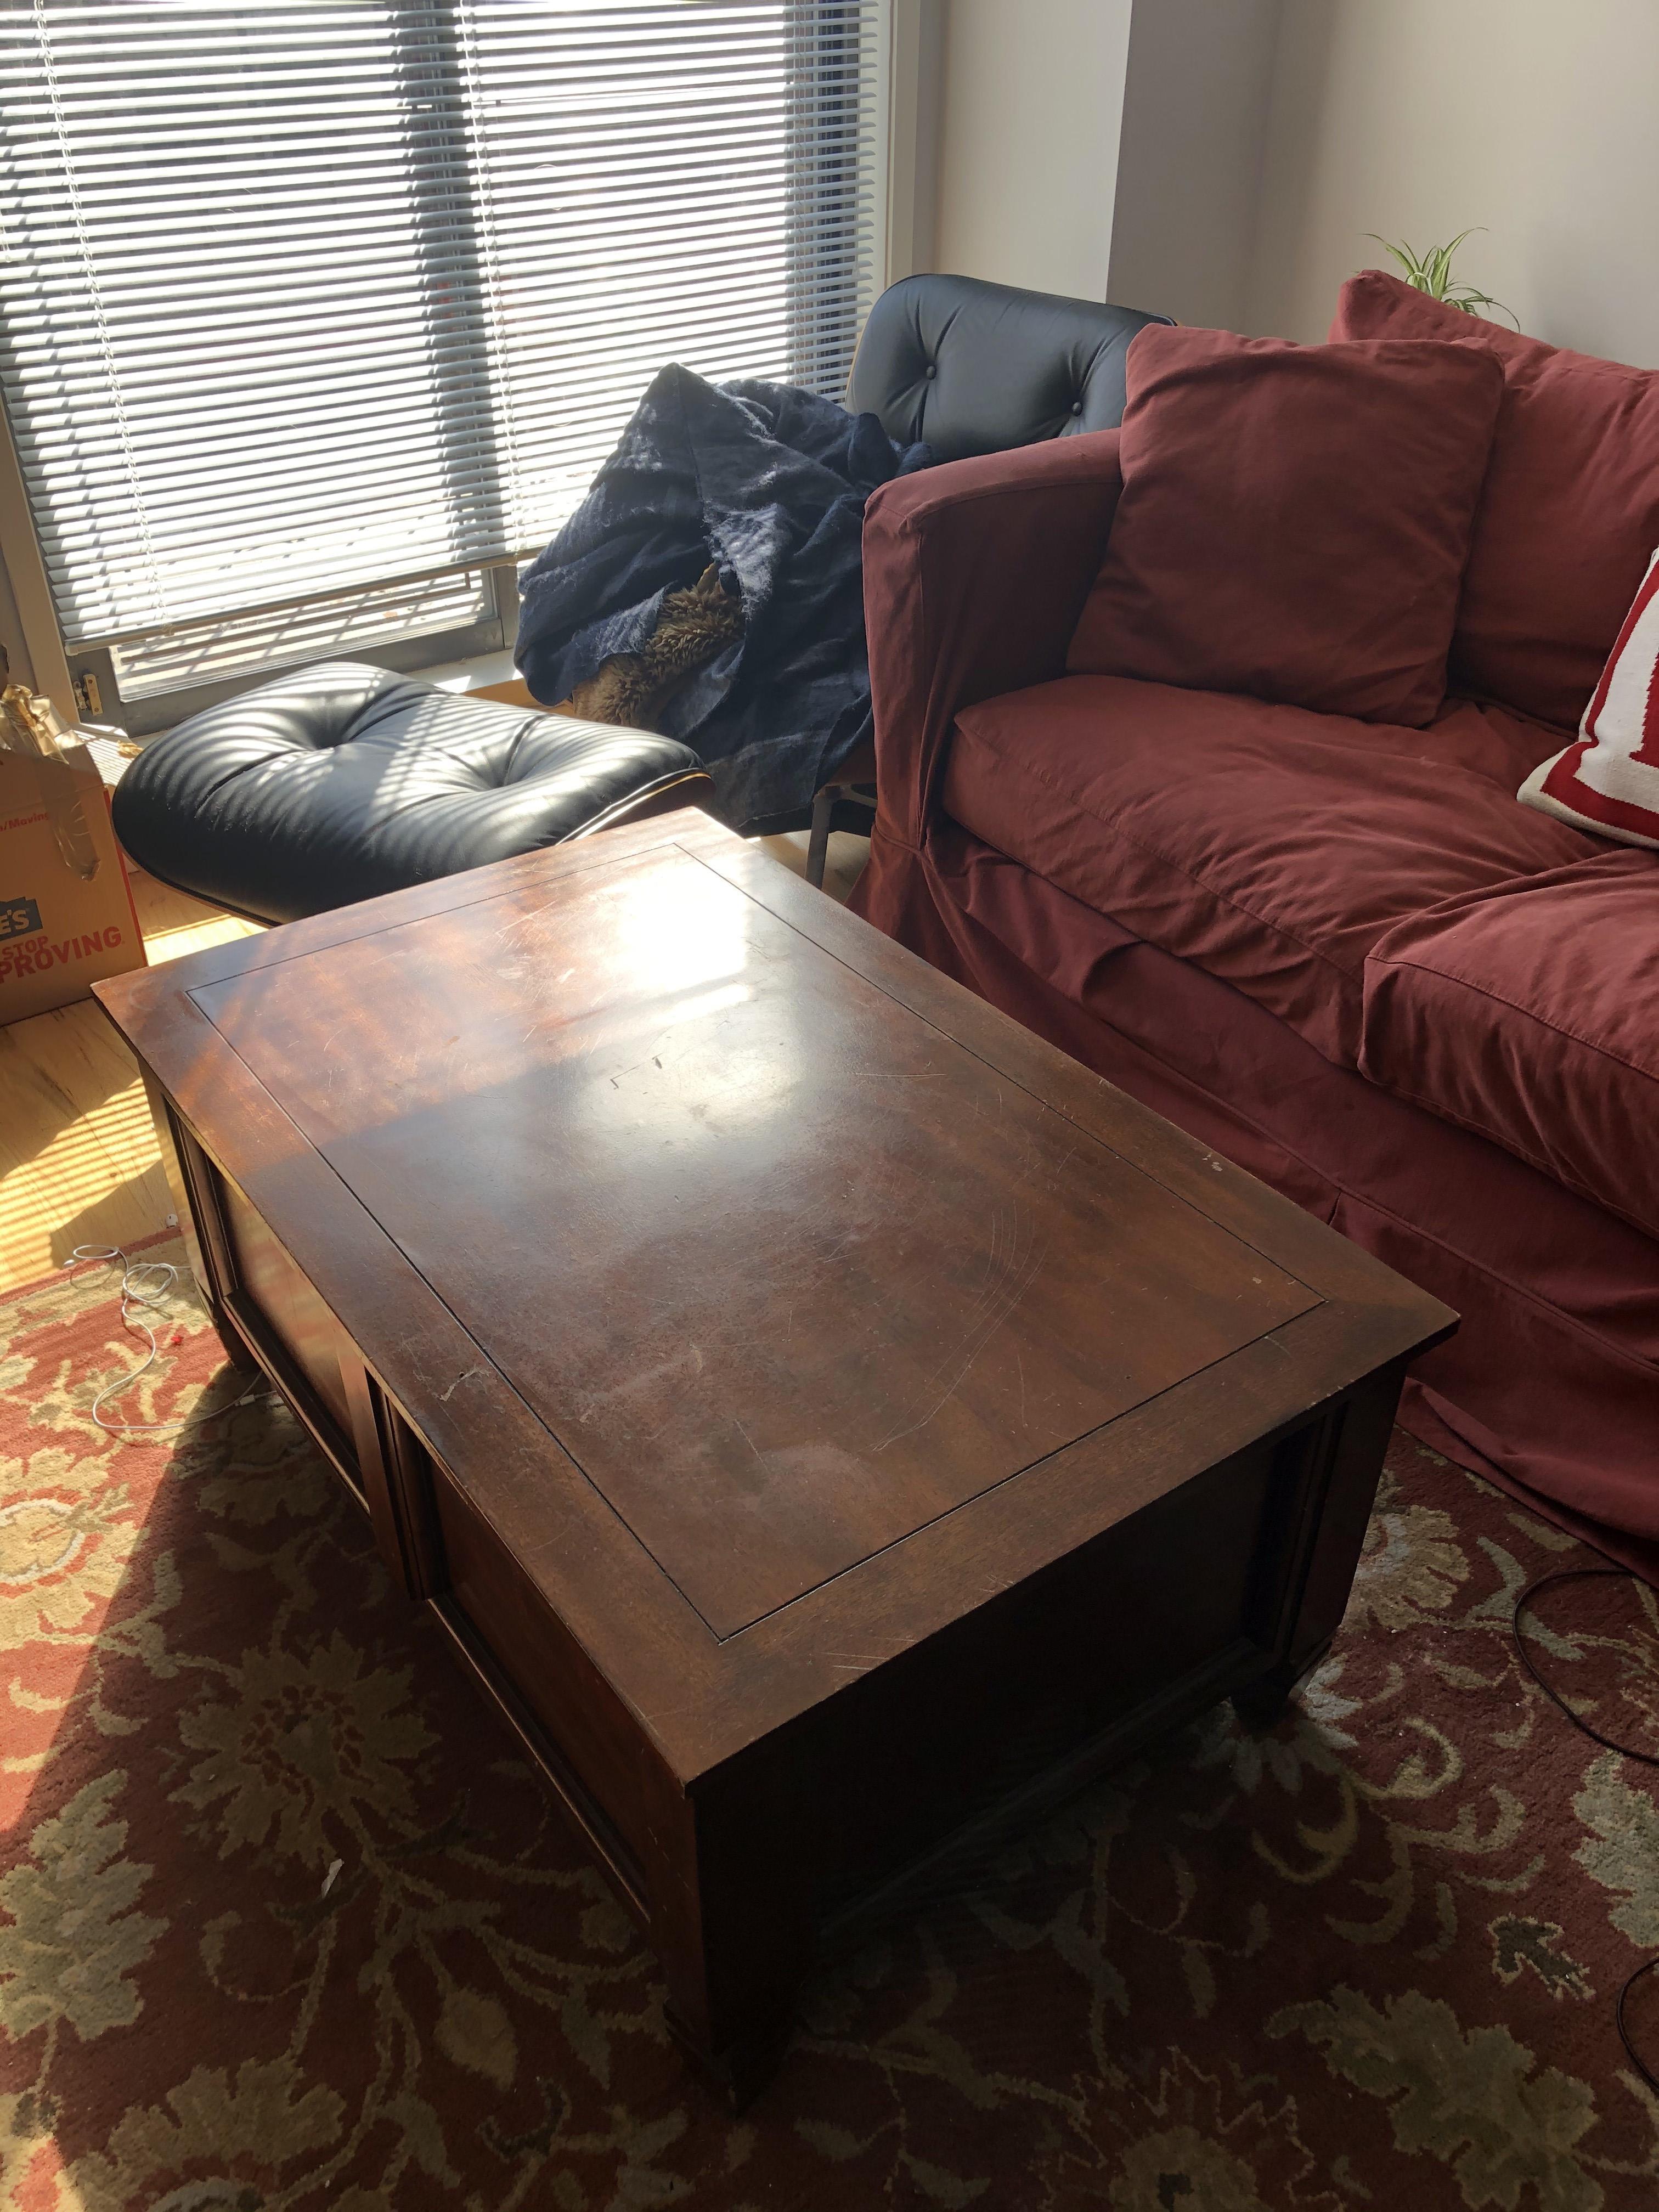 Pottery Barn Coffee Table w/ Storage